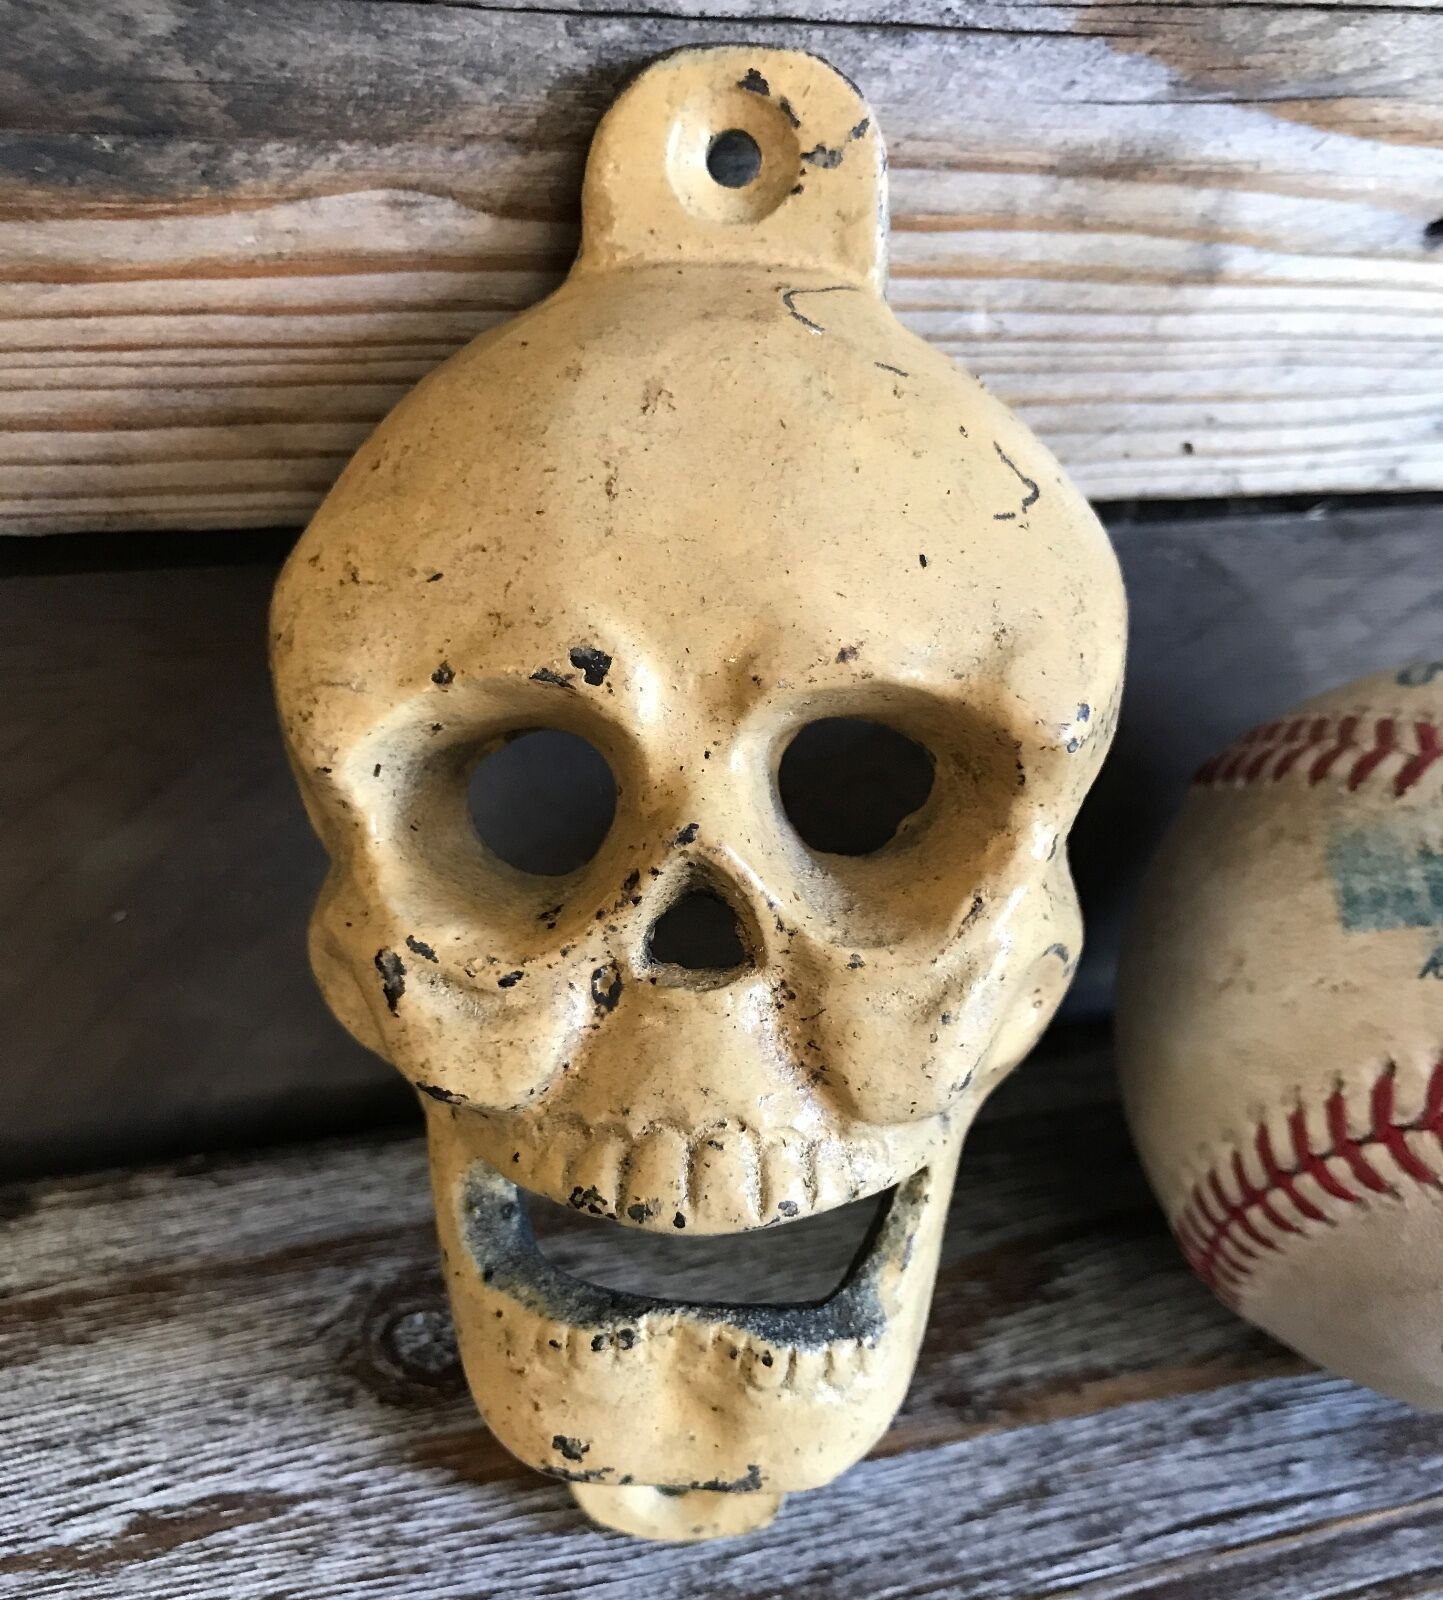 Antique Vintage Skull Cast Iron Bottle Opener Wall Mounted Pub Bar Man Cave Beer